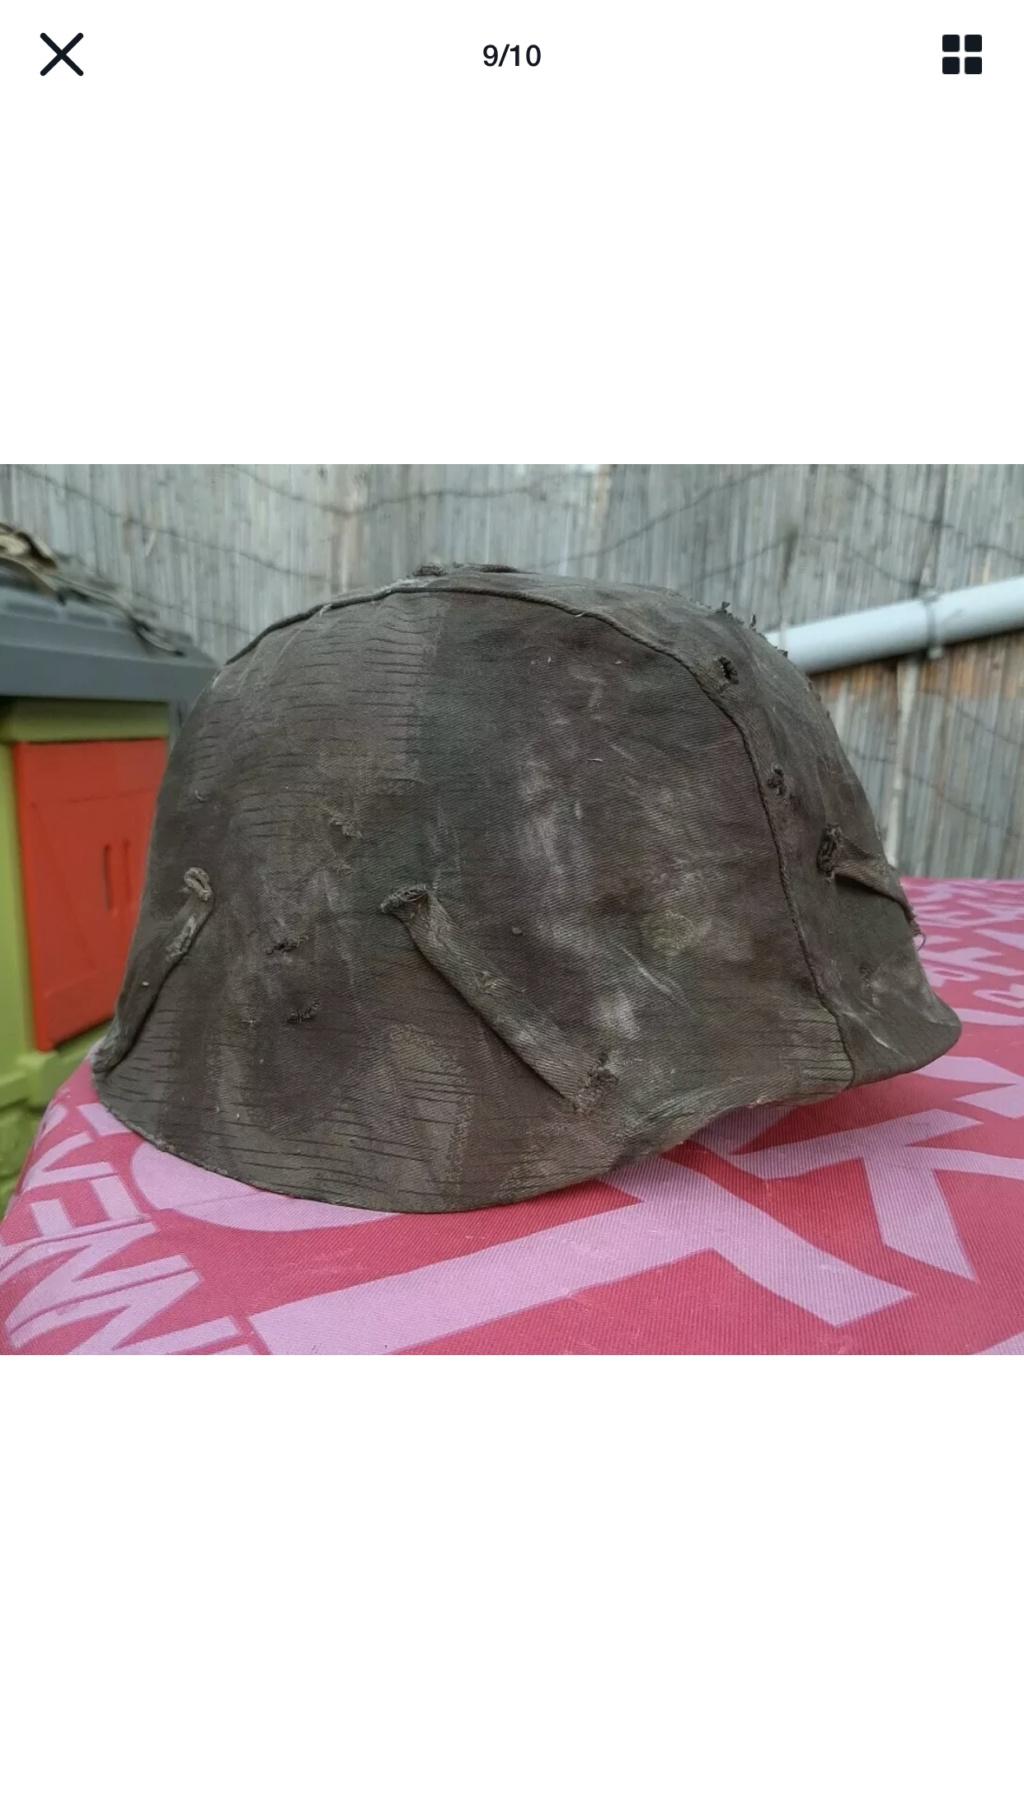 Couvre casque  1ca5a010